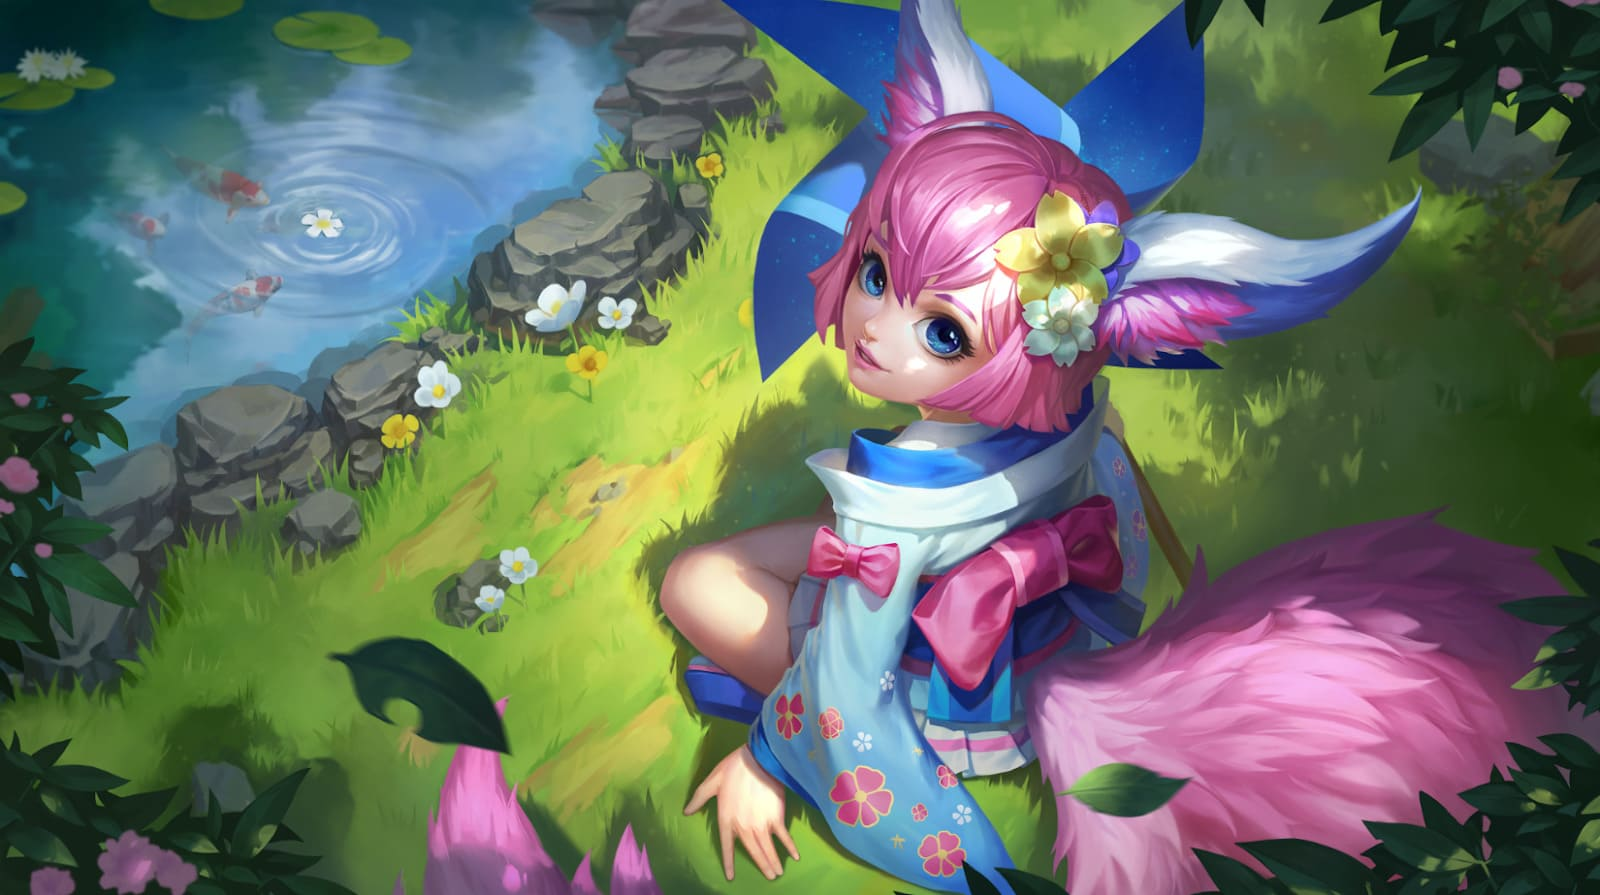 Wallpaper Nana Wind Fairy Skin Mobile Legends HD for PC